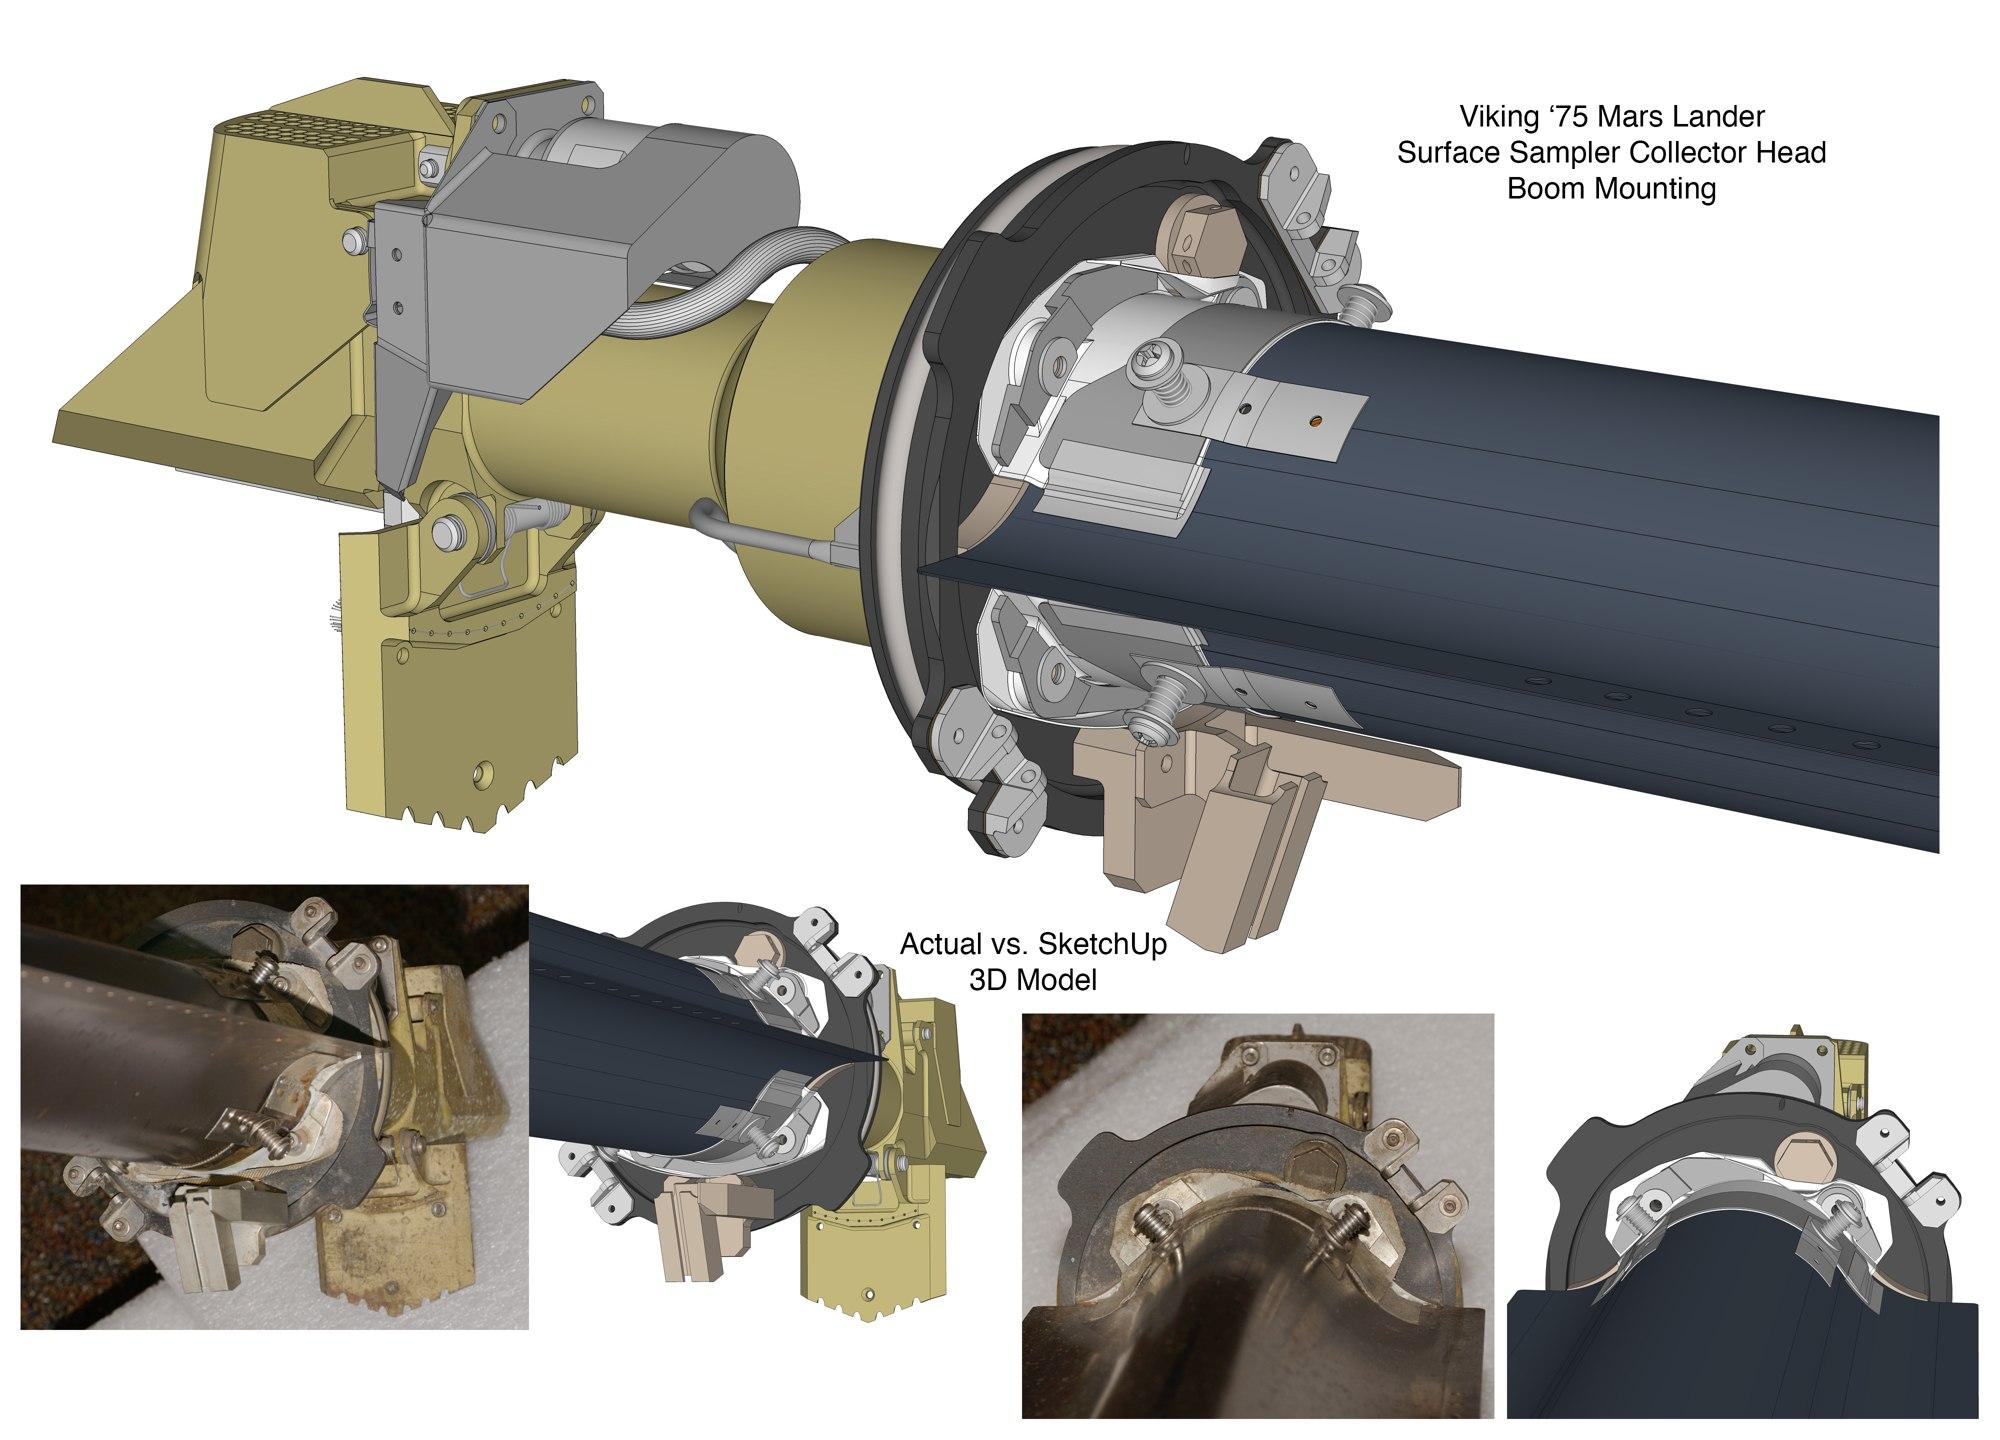 Viking '75 Mars Lander Construction - Unmanned Spaceflight com